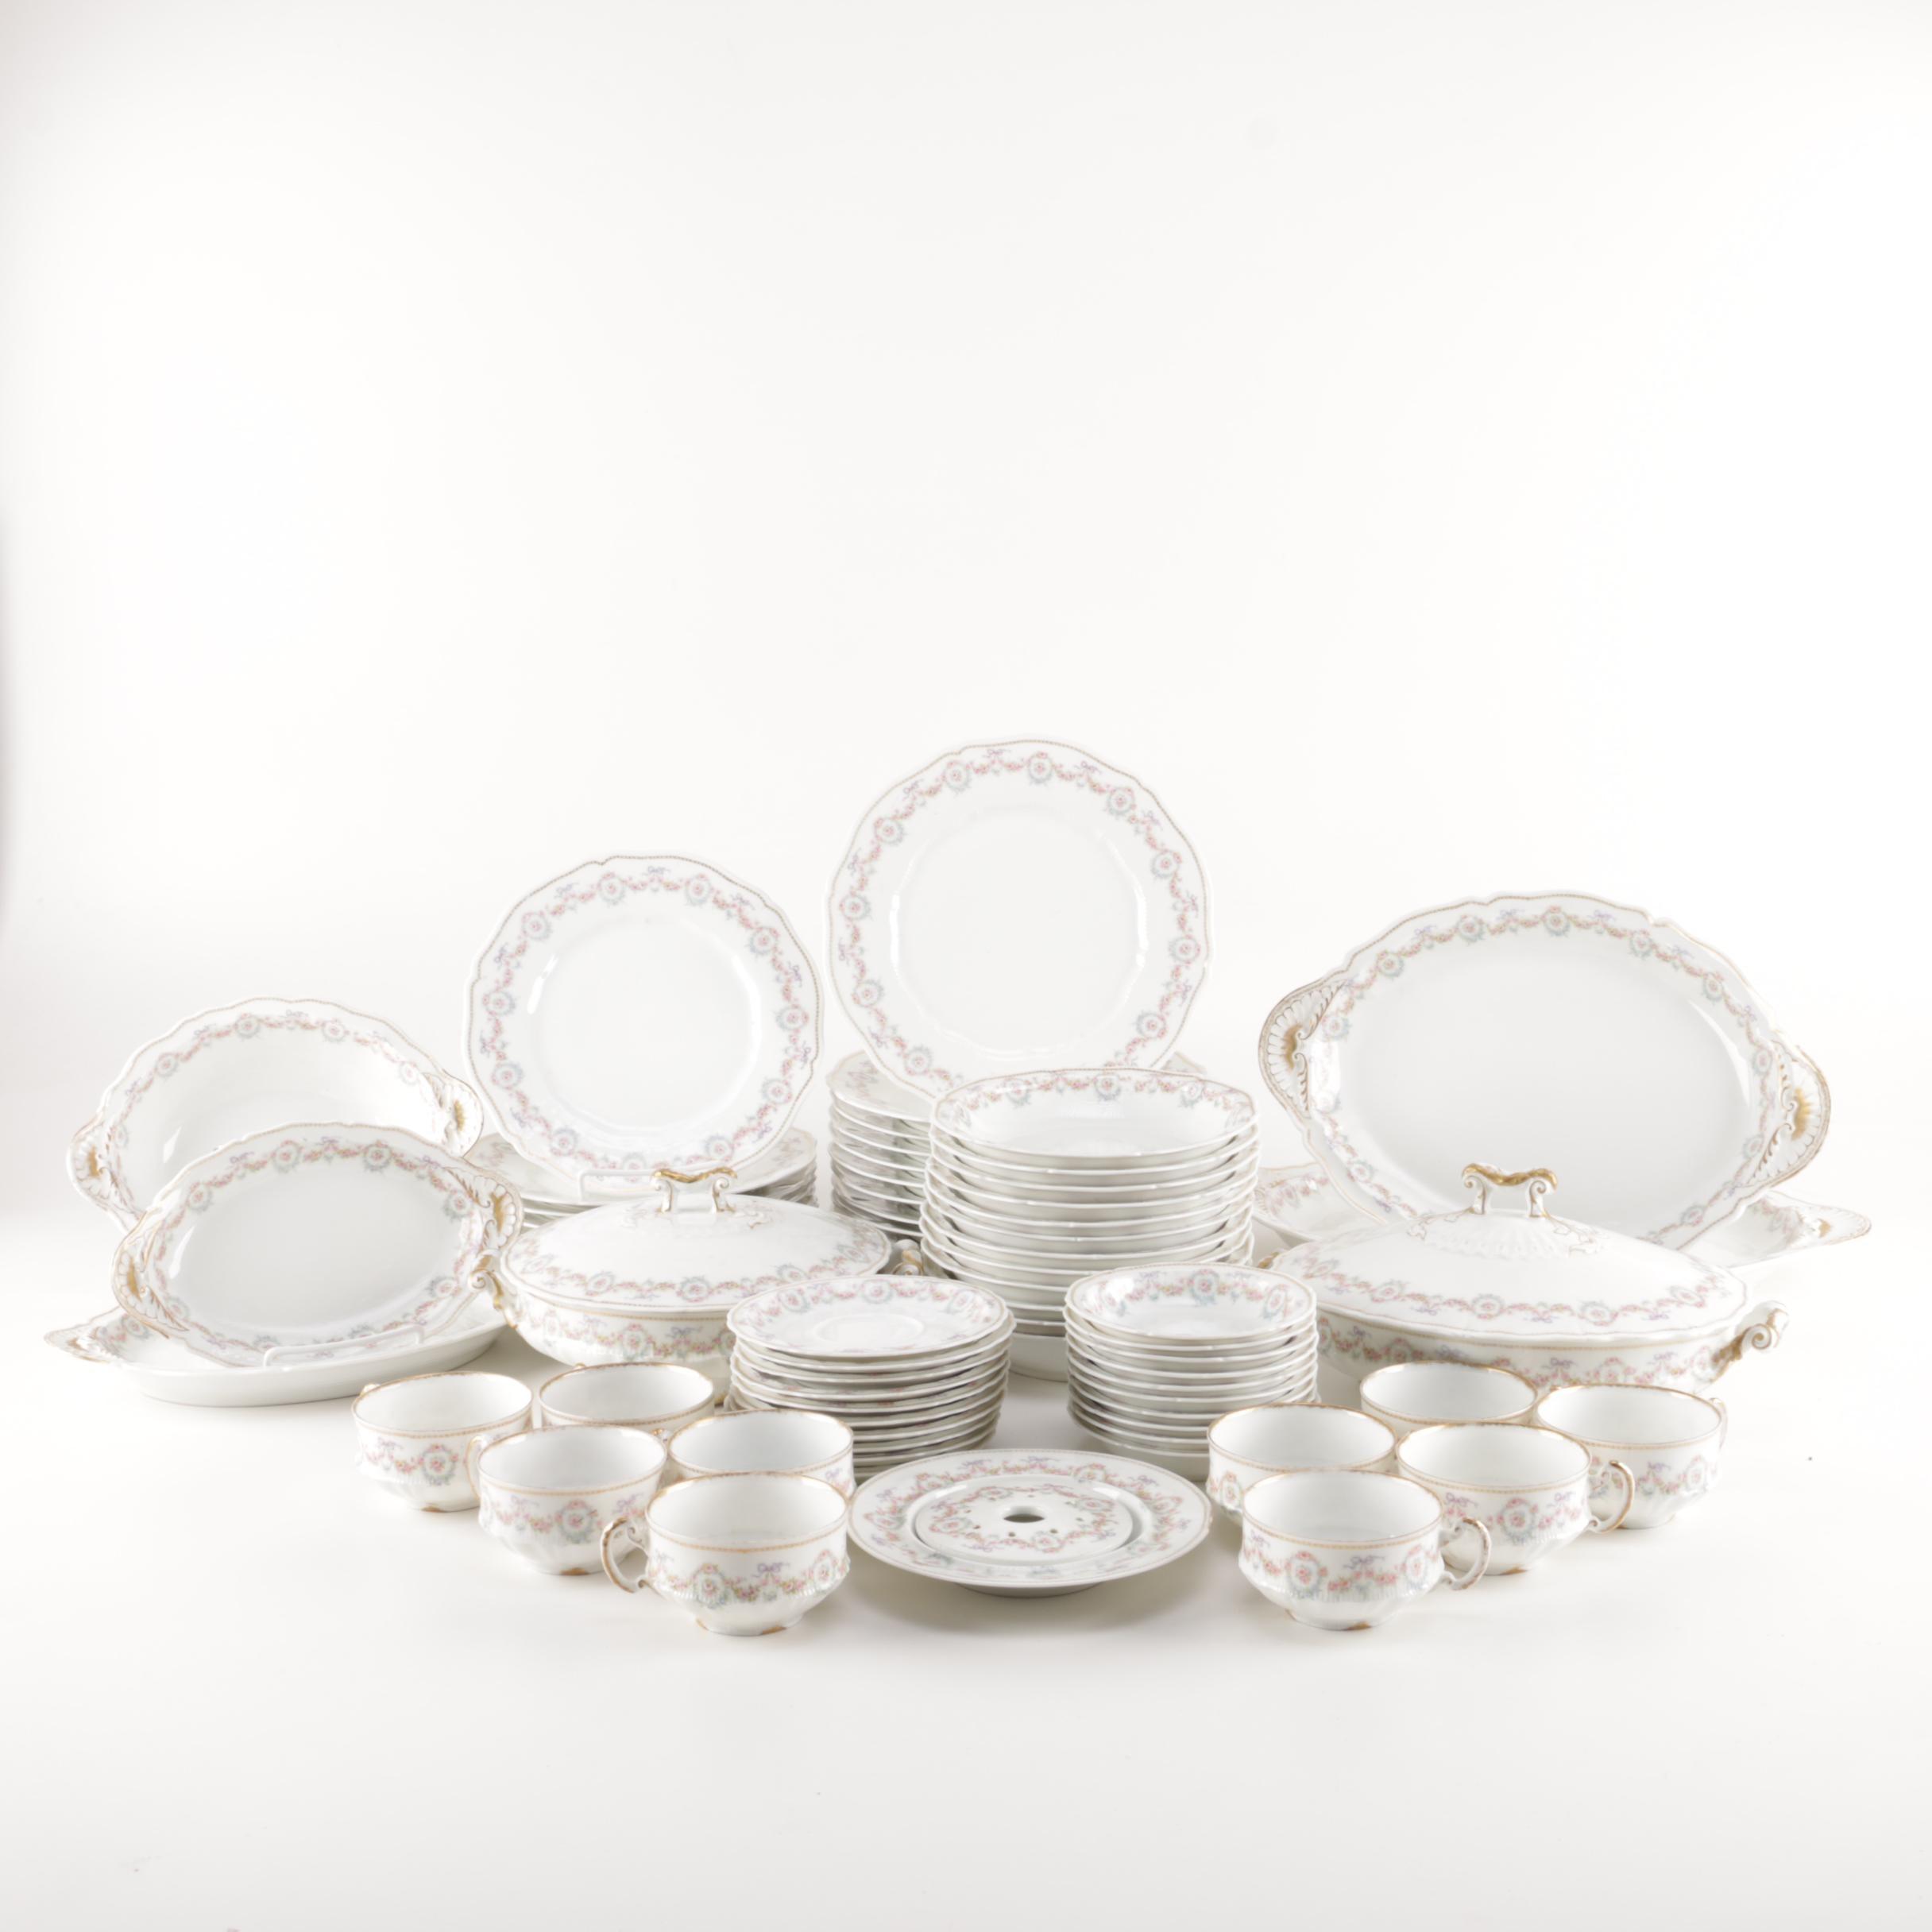 Generous Set of Théodore Haviland Limoges Porcelain Tableware